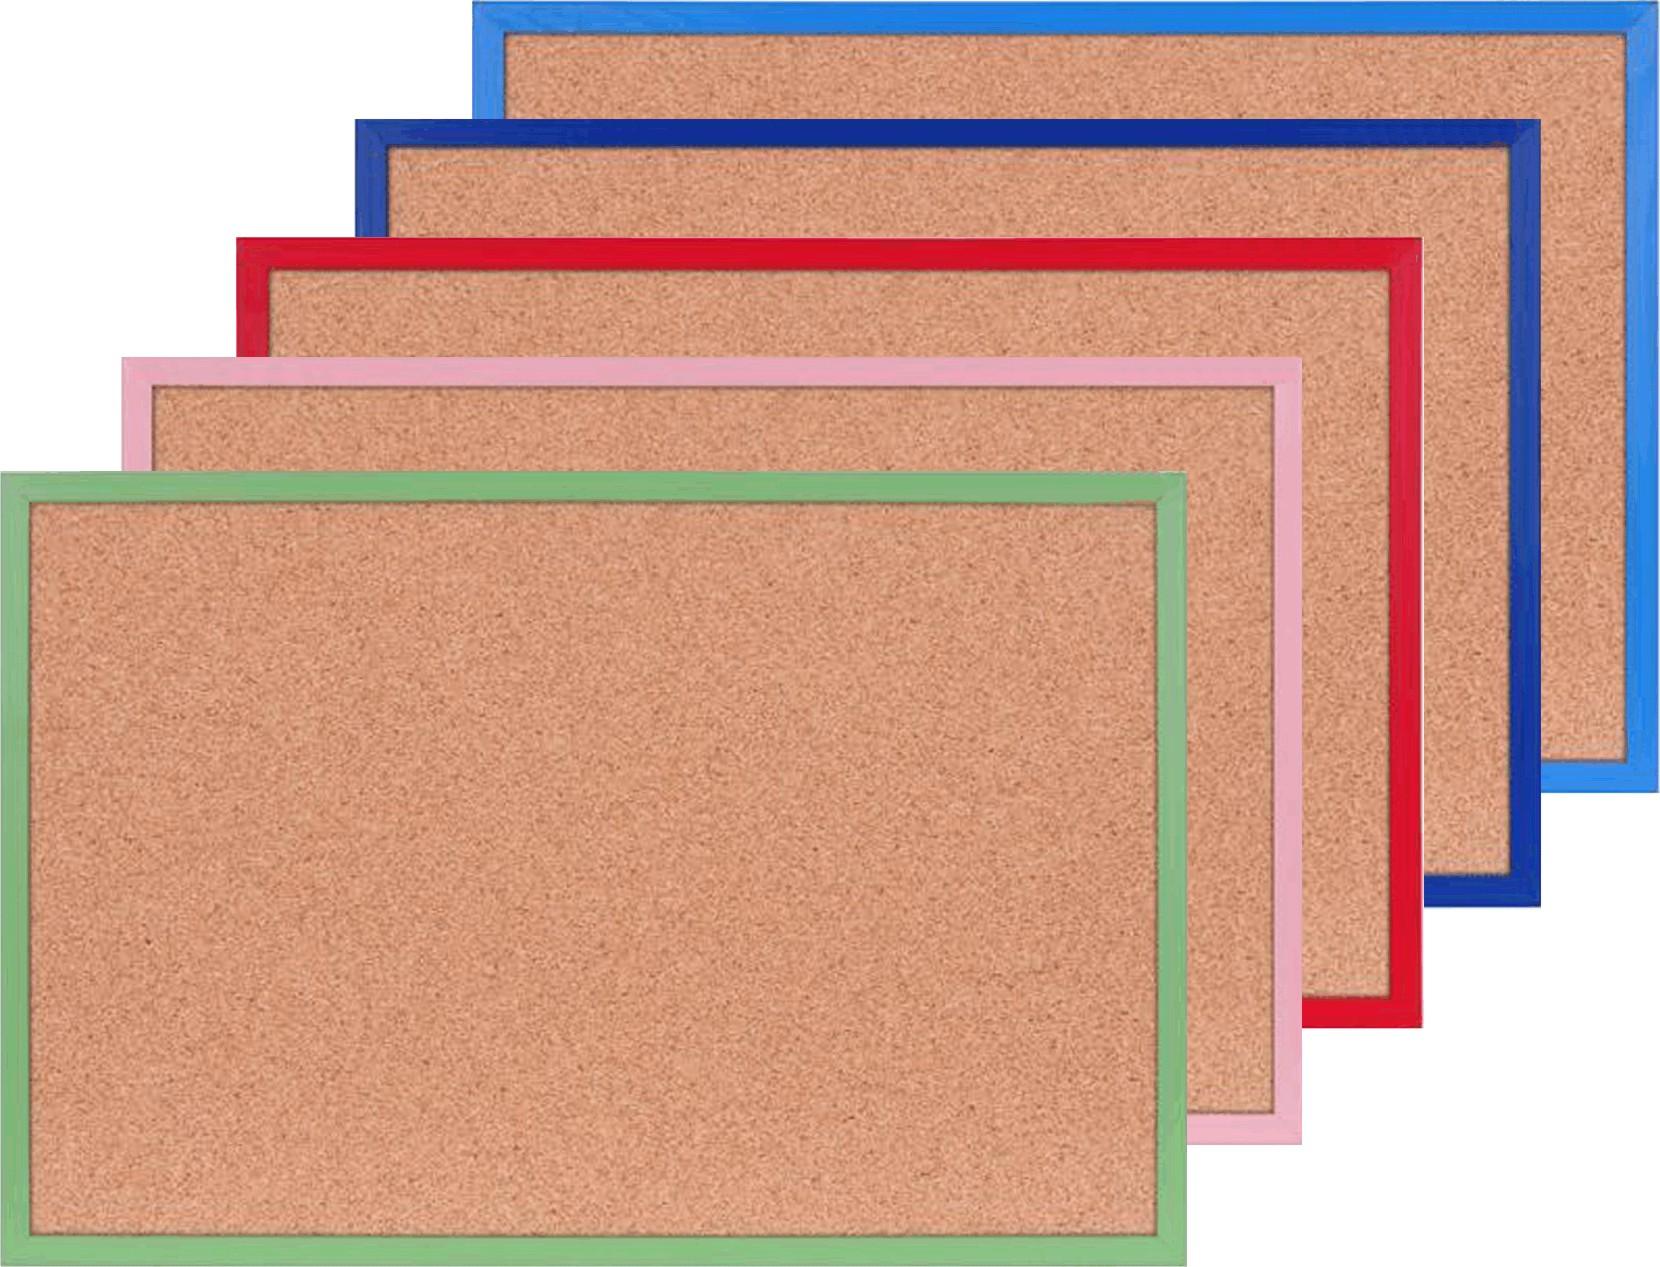 pinnwand korkboard in ihrer farbe 40 x 60 cm pinwand korkwand pinntafel memo ebay. Black Bedroom Furniture Sets. Home Design Ideas